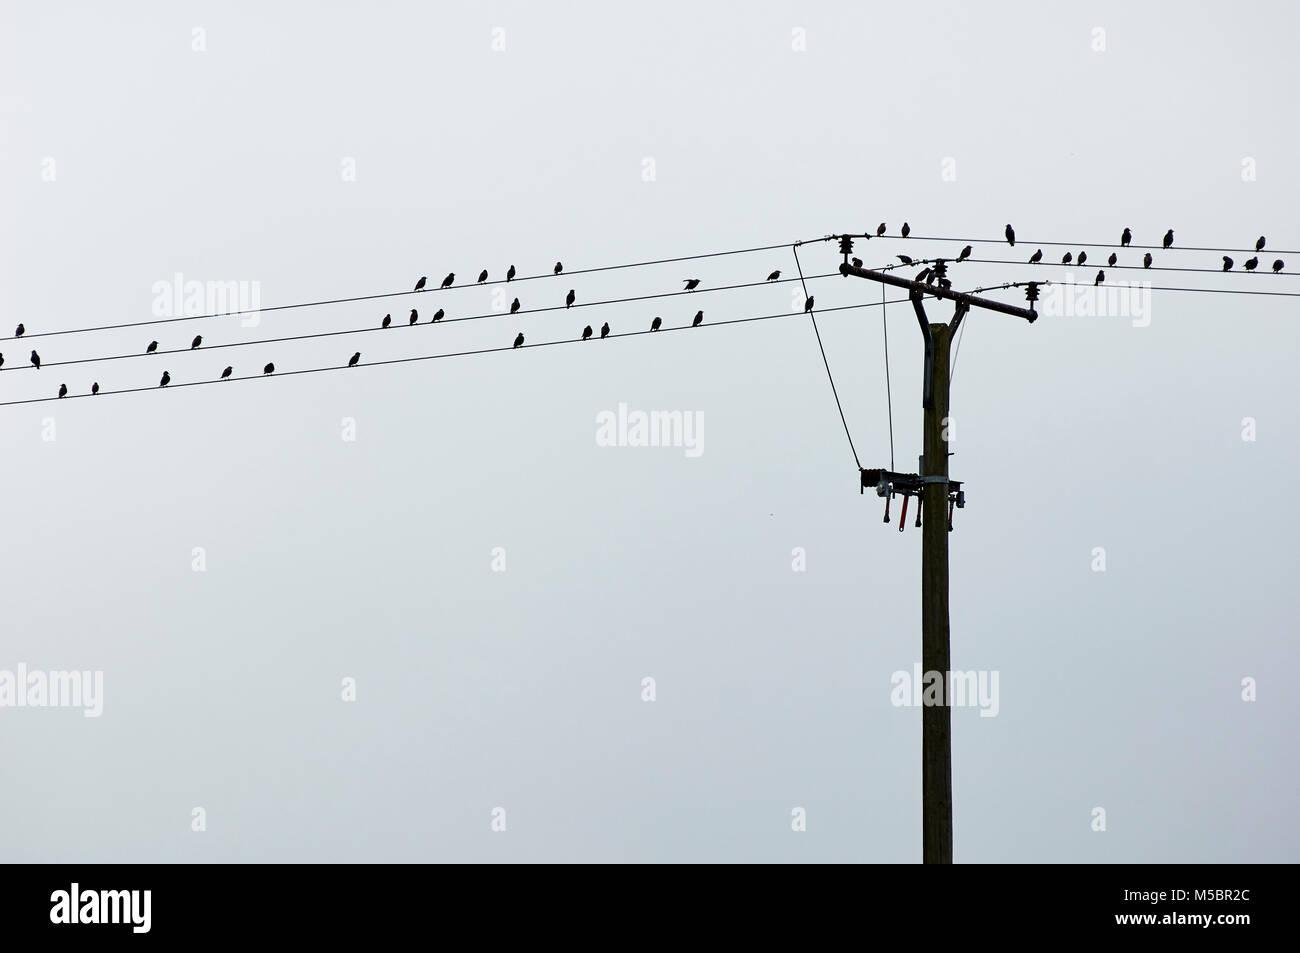 Vogelgruppe macht Pause - Stock Image